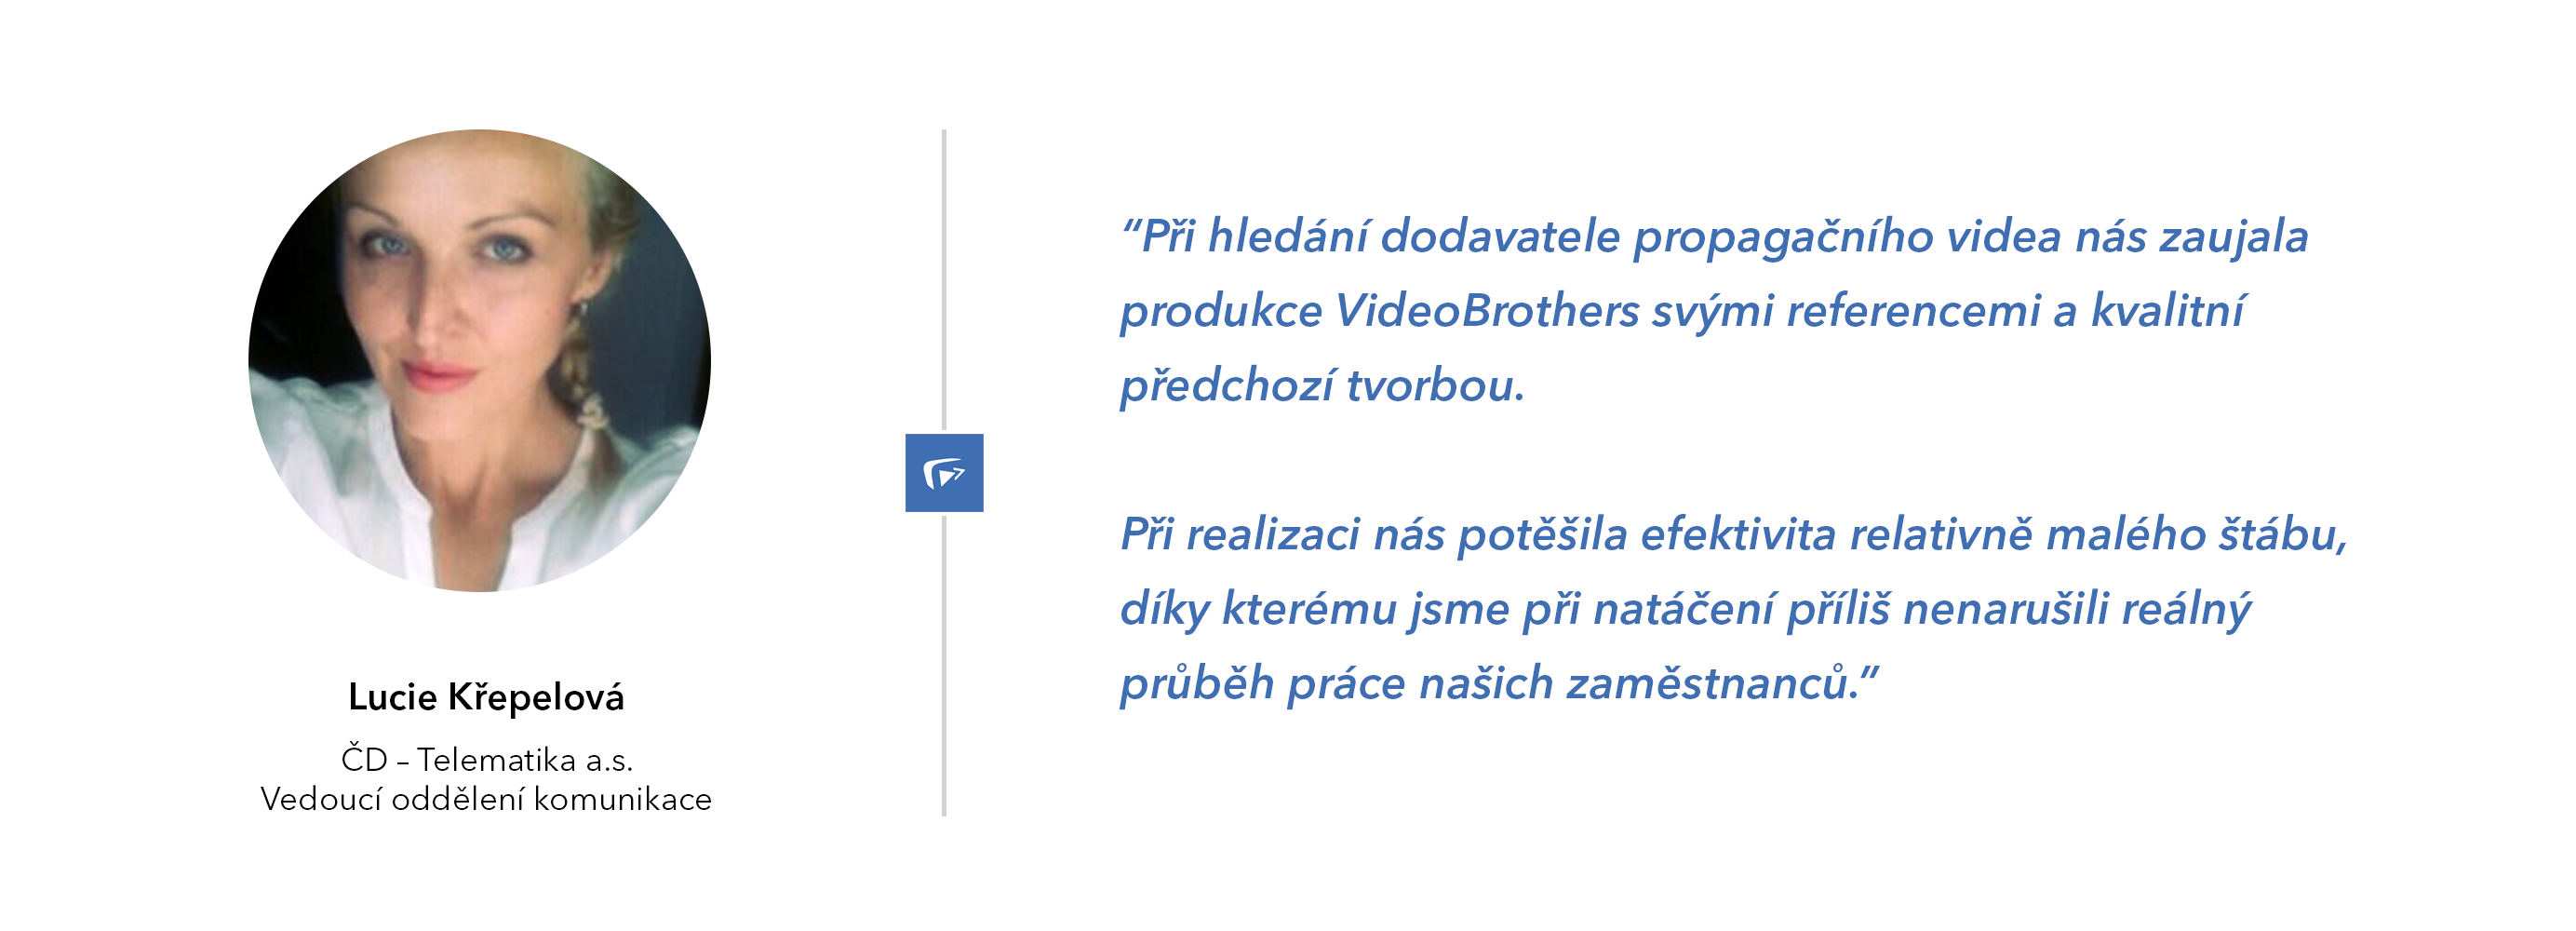 CD telematika doporučuje VideoBrothers